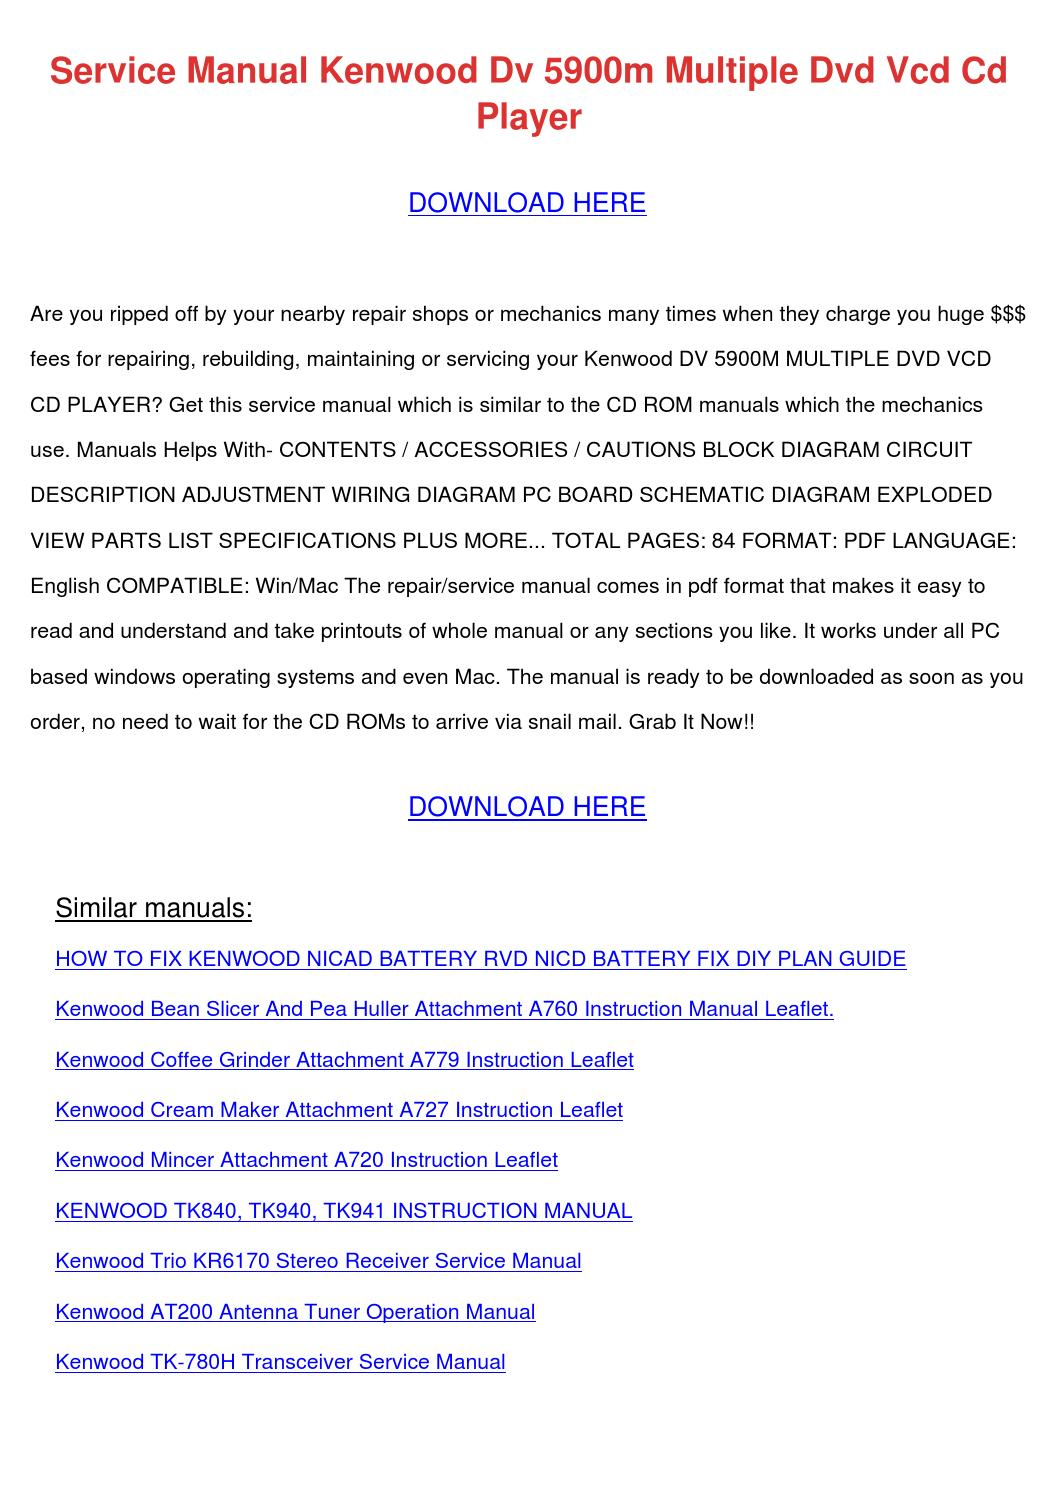 hight resolution of service manual kenwood dv 5900m multiple dvd